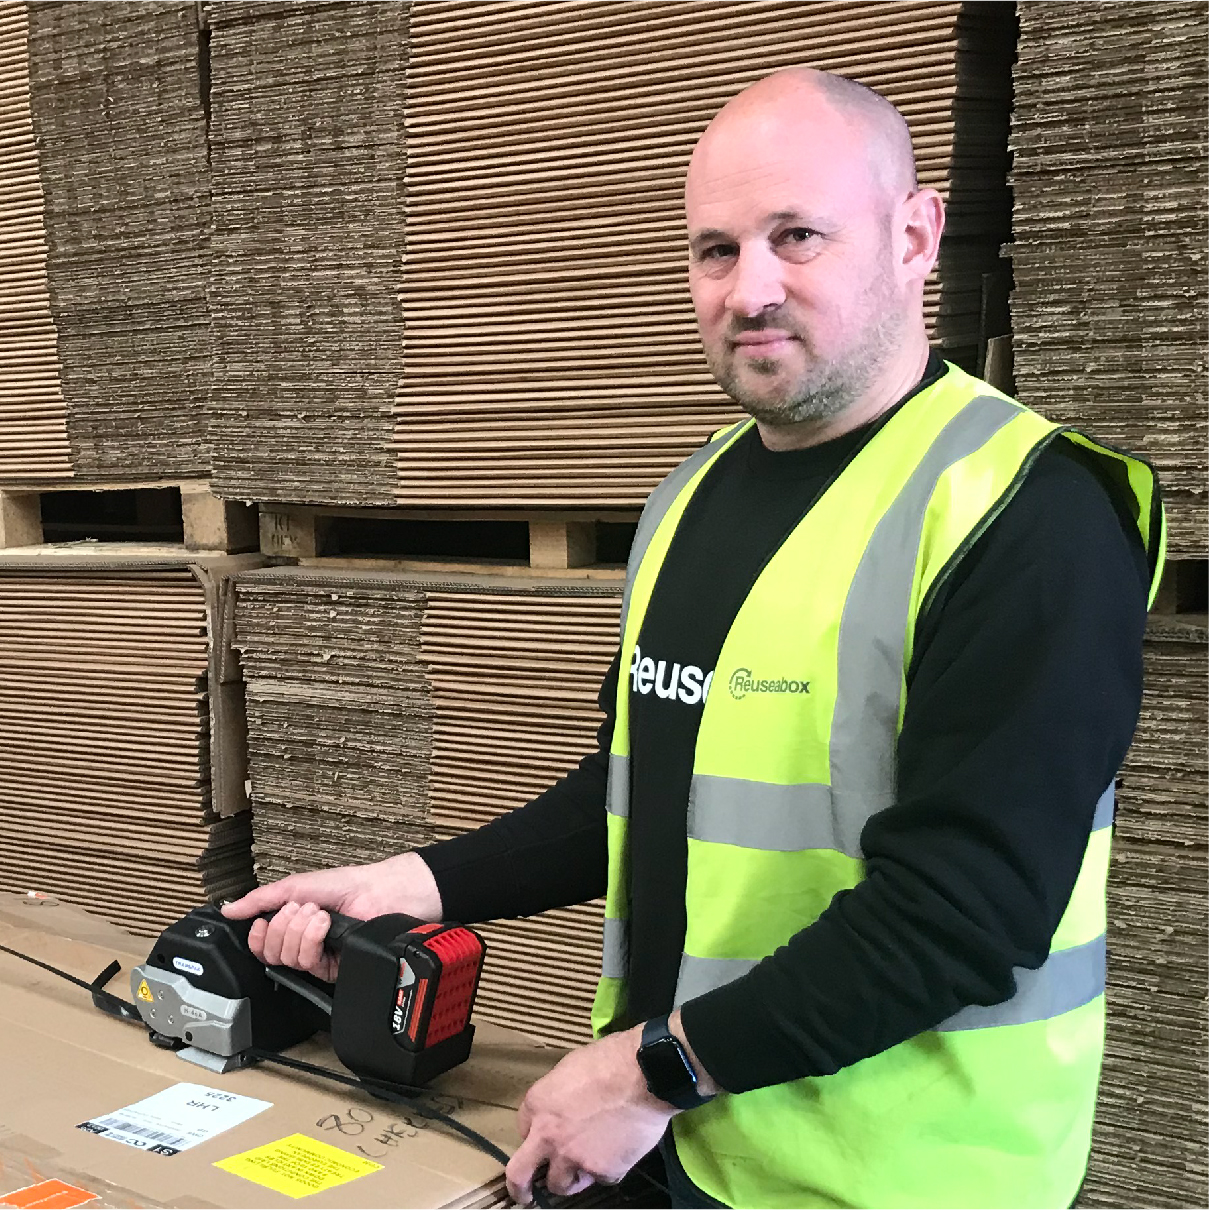 Mark warehouse operative at Reuseabox